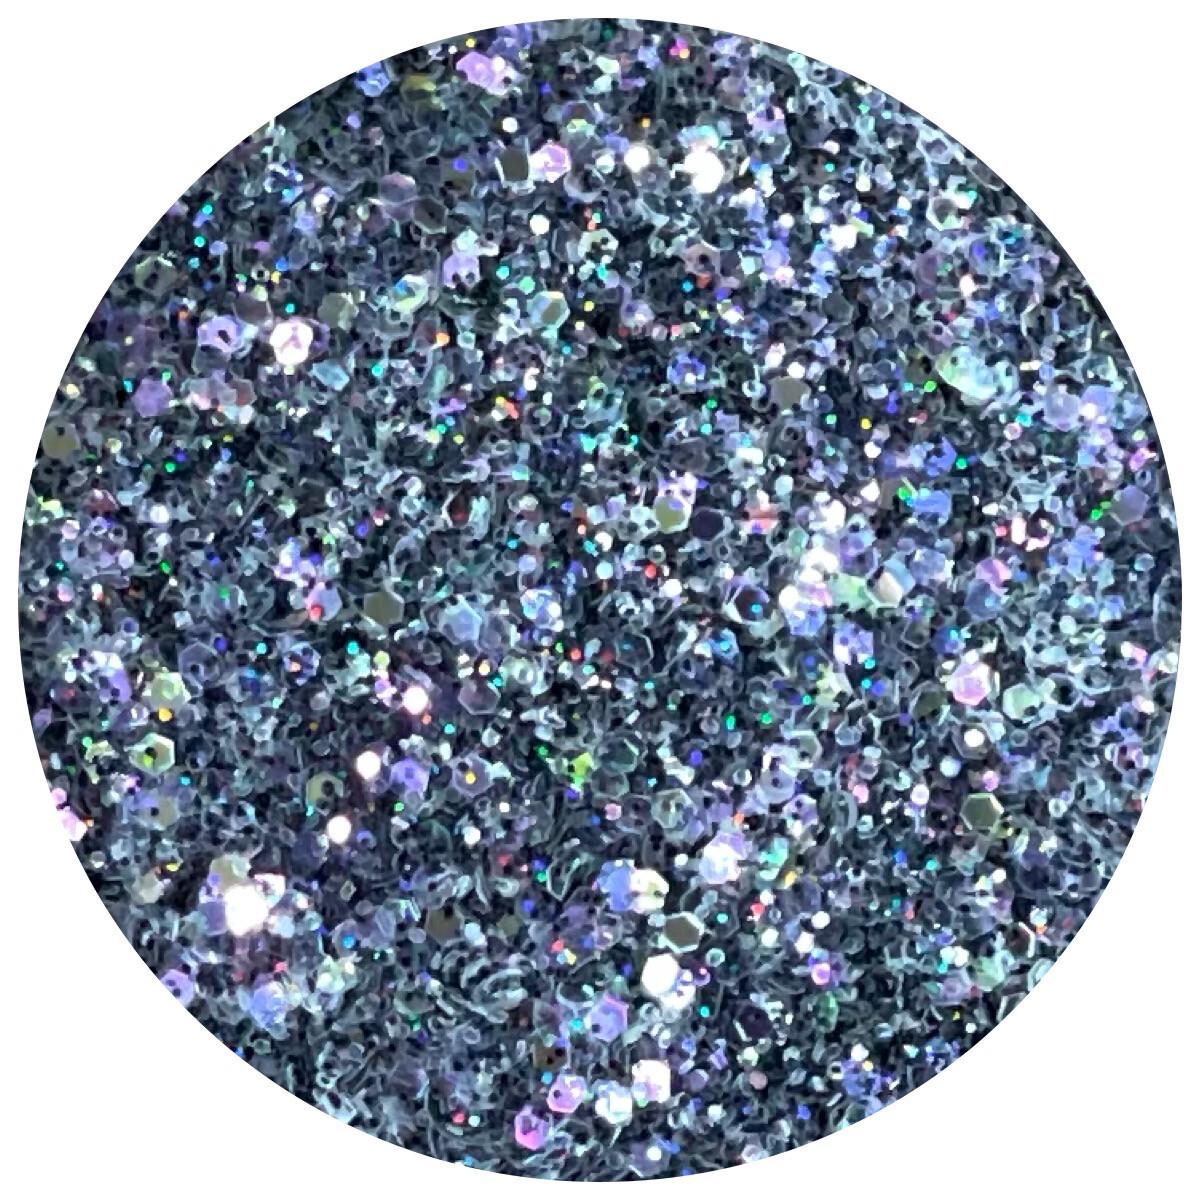 Charcoal Gray Holo 1oz Jar